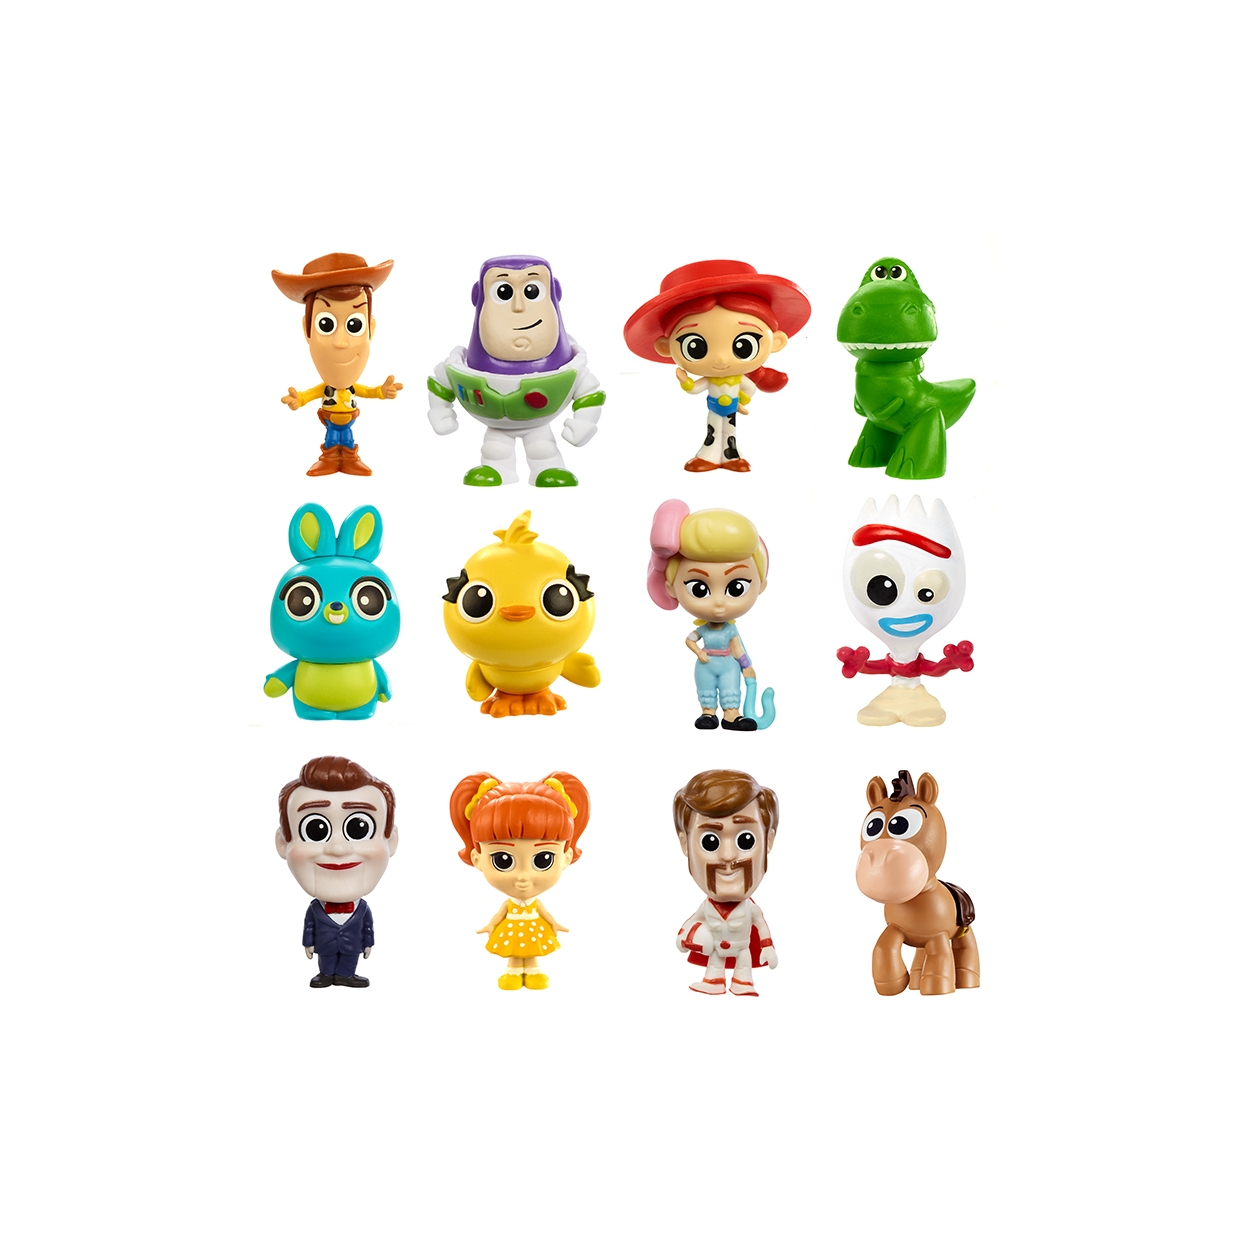 Nova Mini Figura Personagem Toy story 4 - sortimento